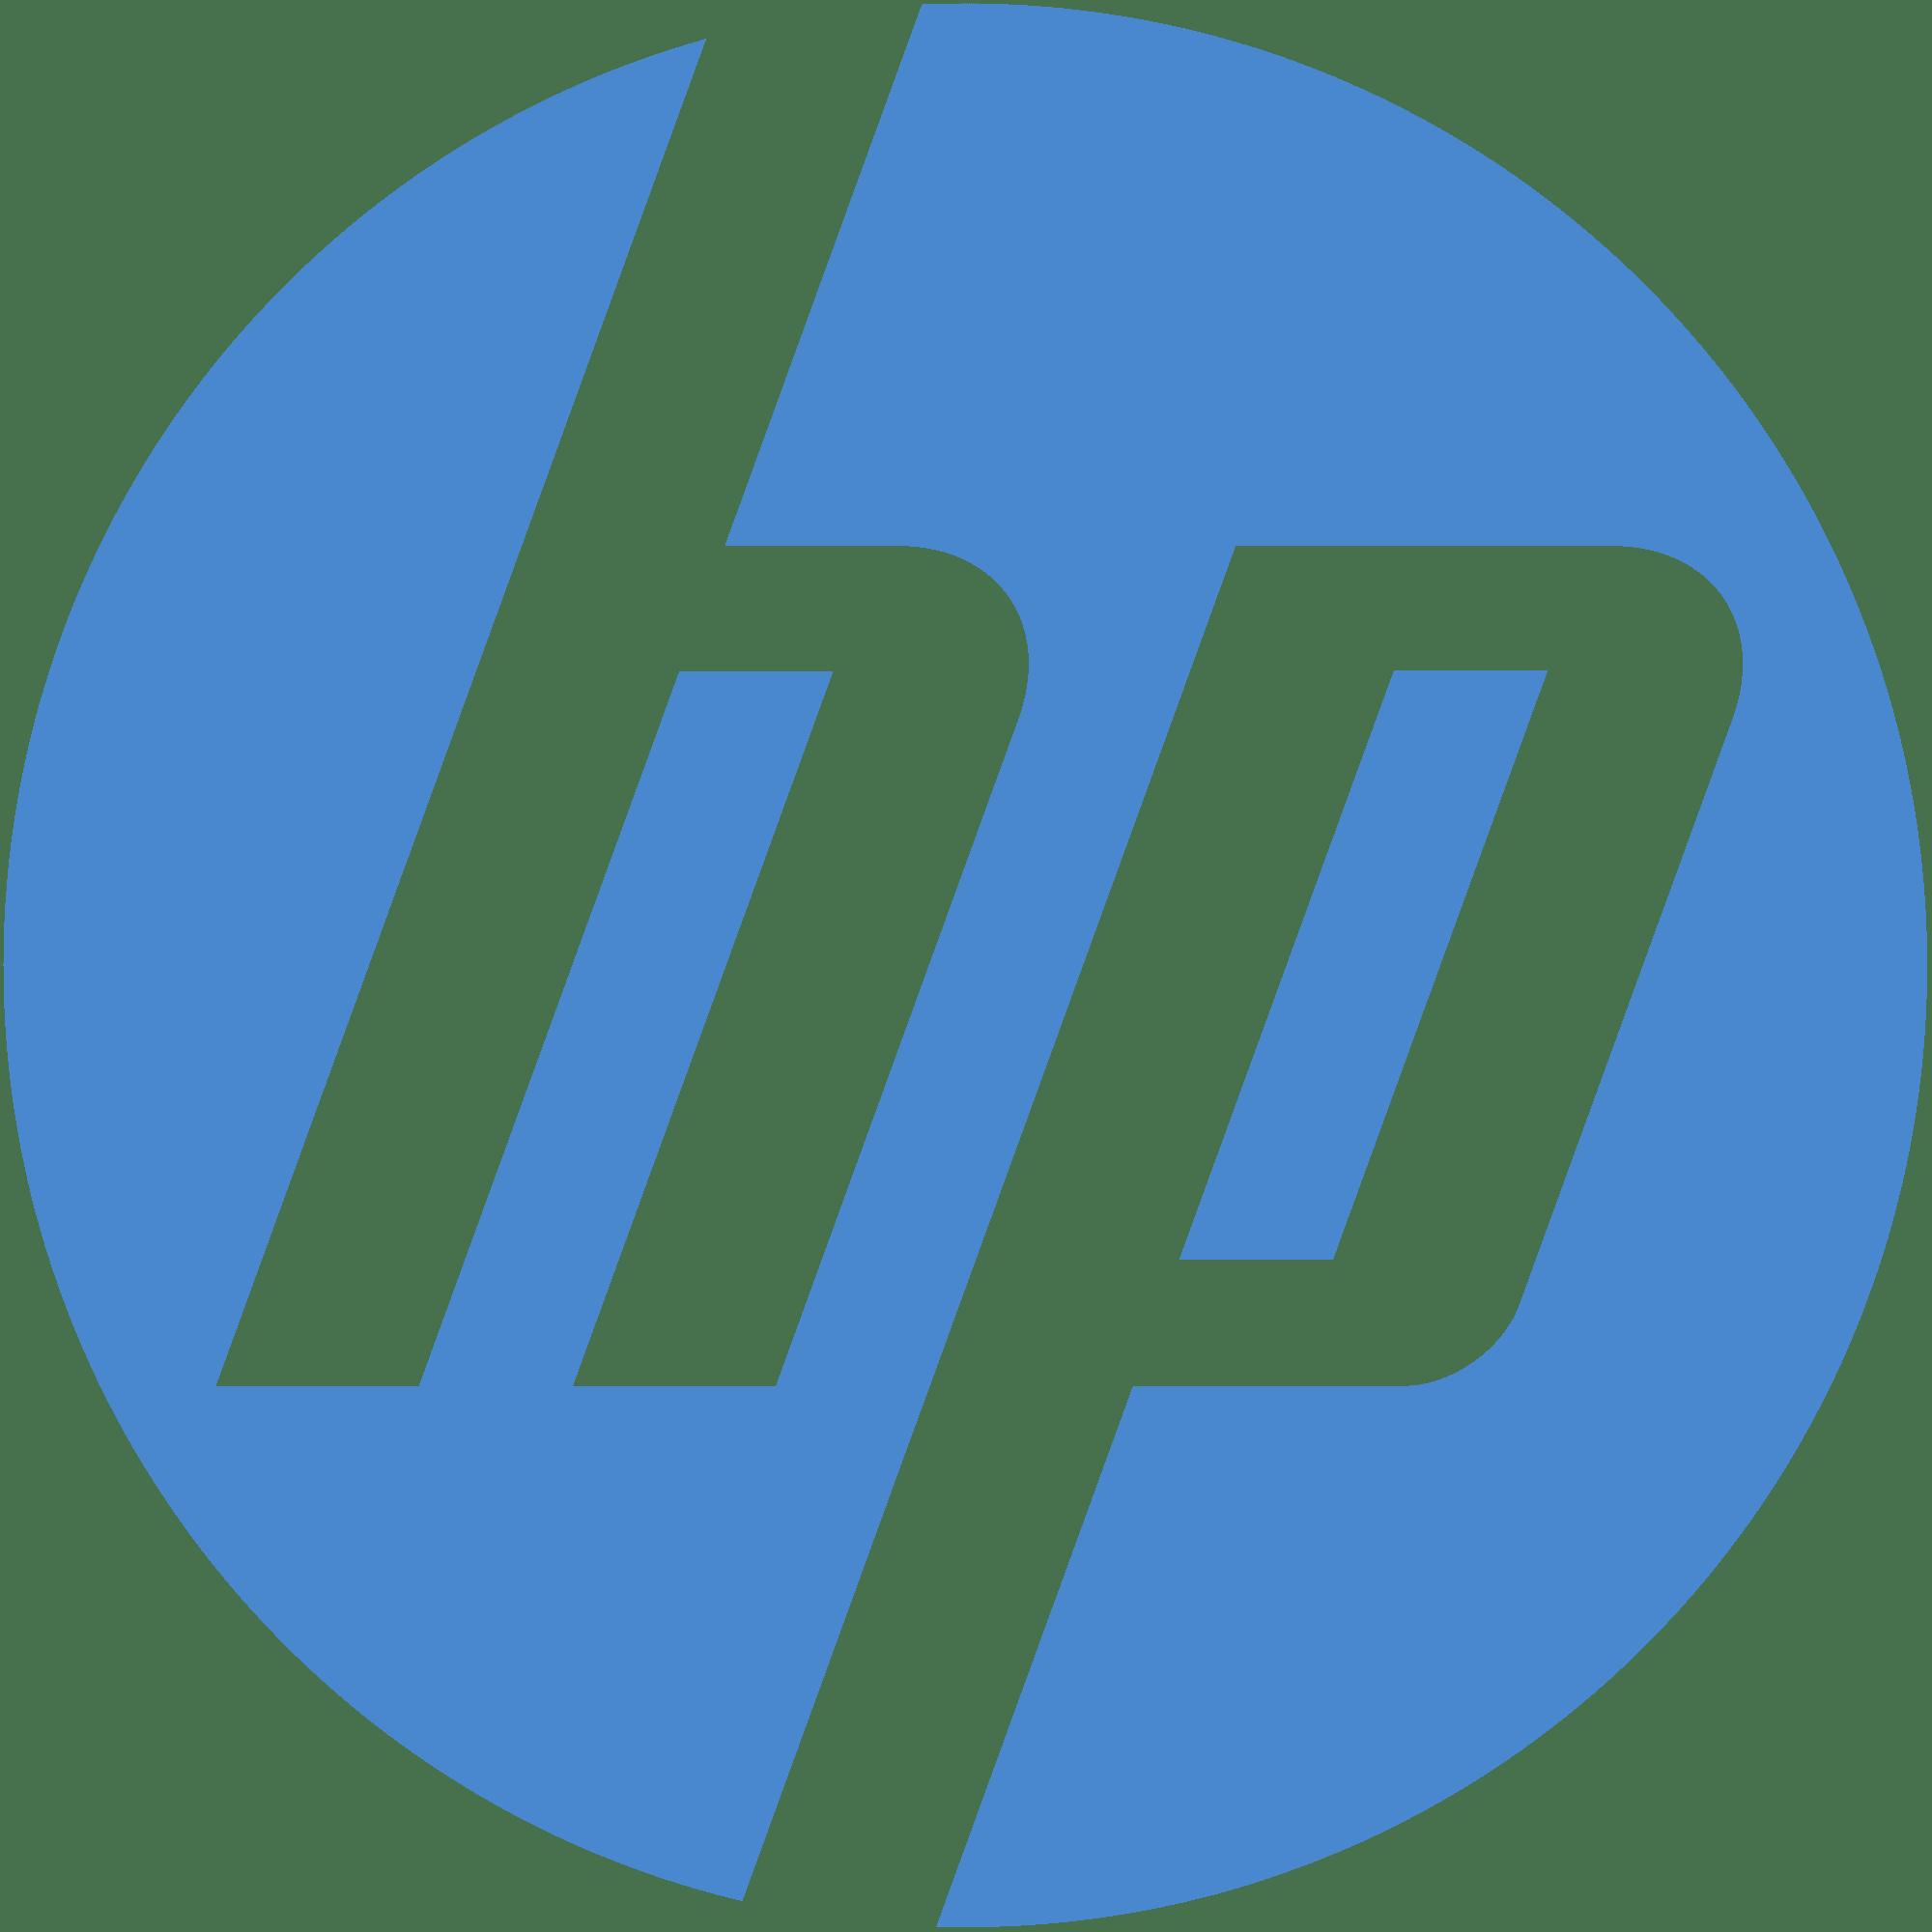 HP L1940T 19-inch LCD Monitor drivers